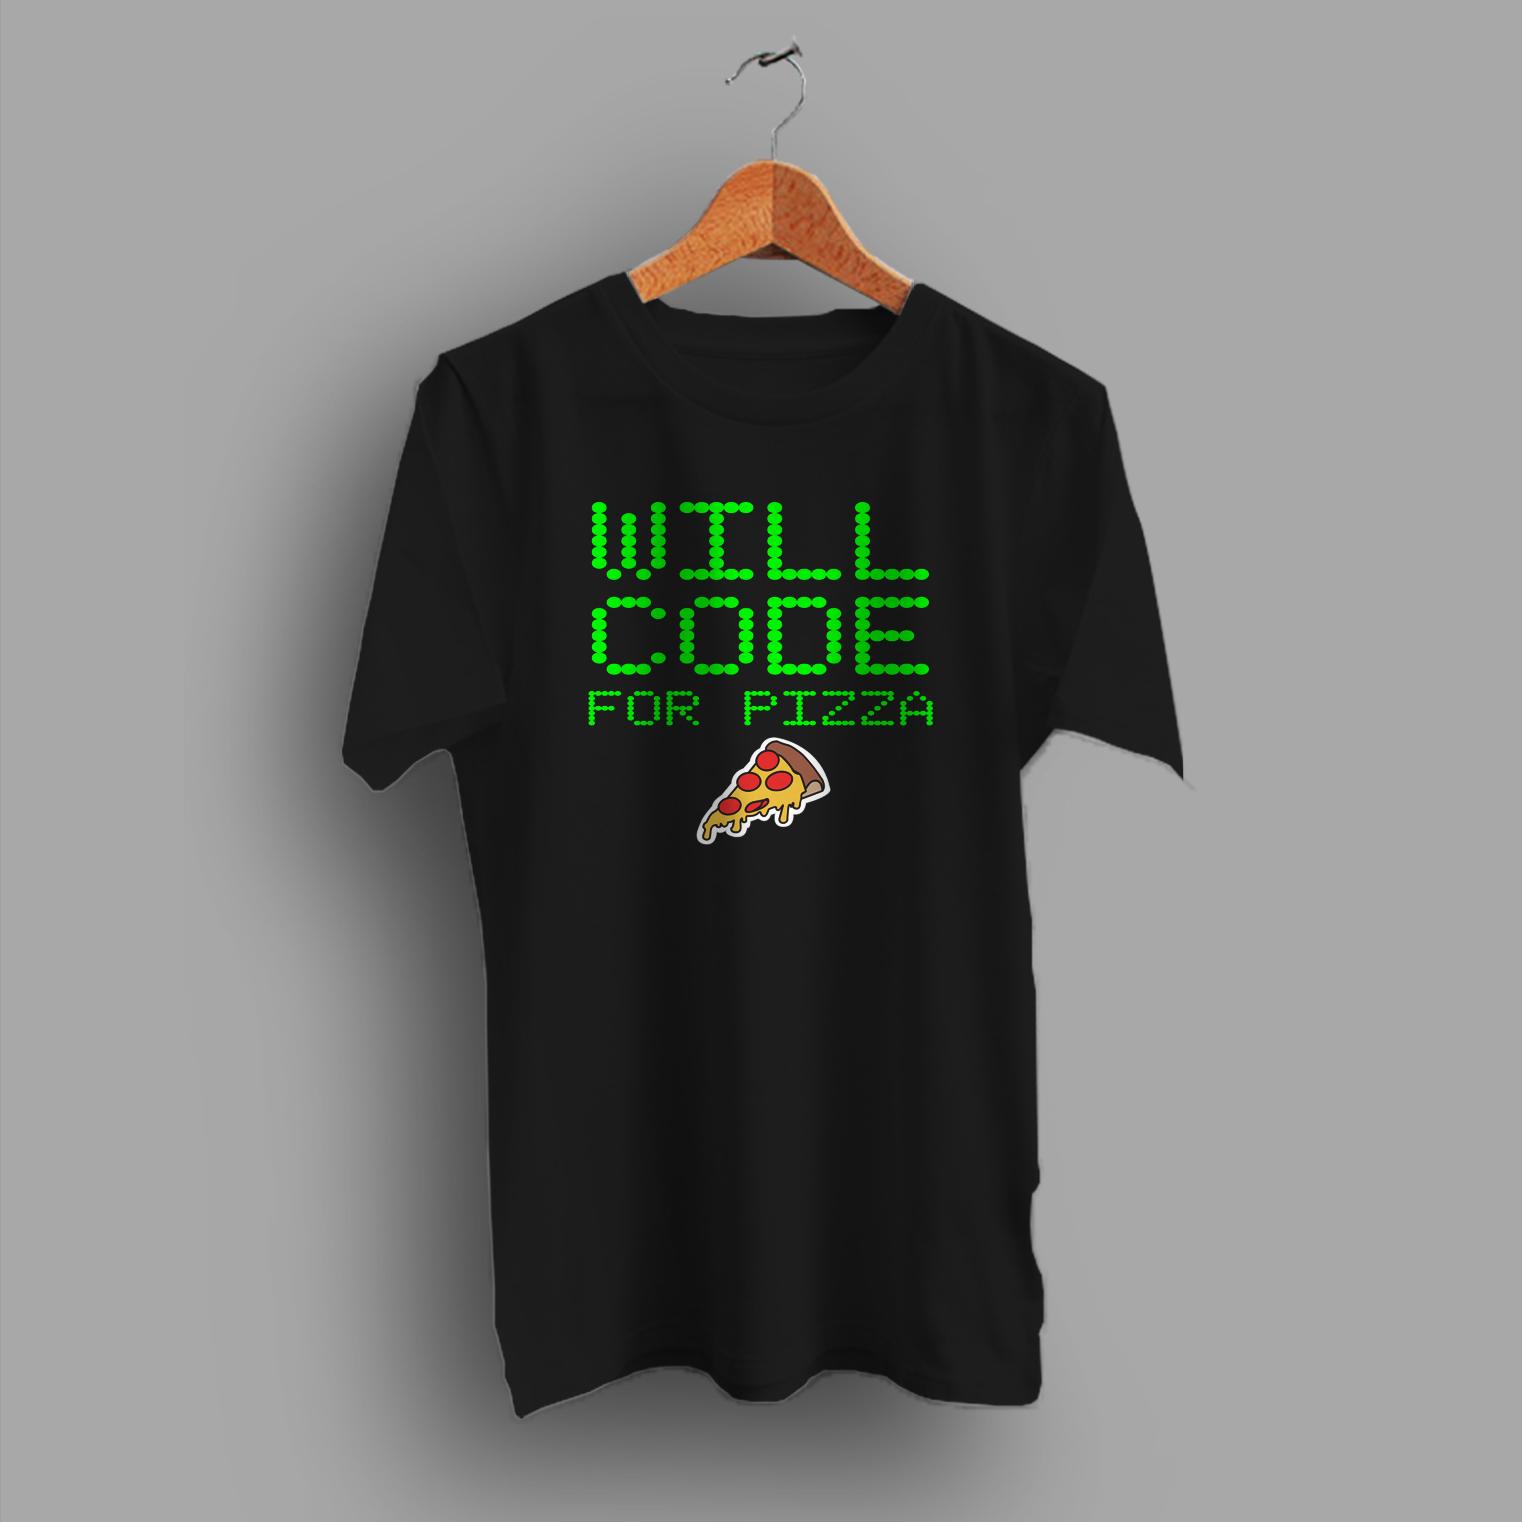 bed4b7b3 Will Code For Pizza Programer Gift Geek T Shirt - Hotvero